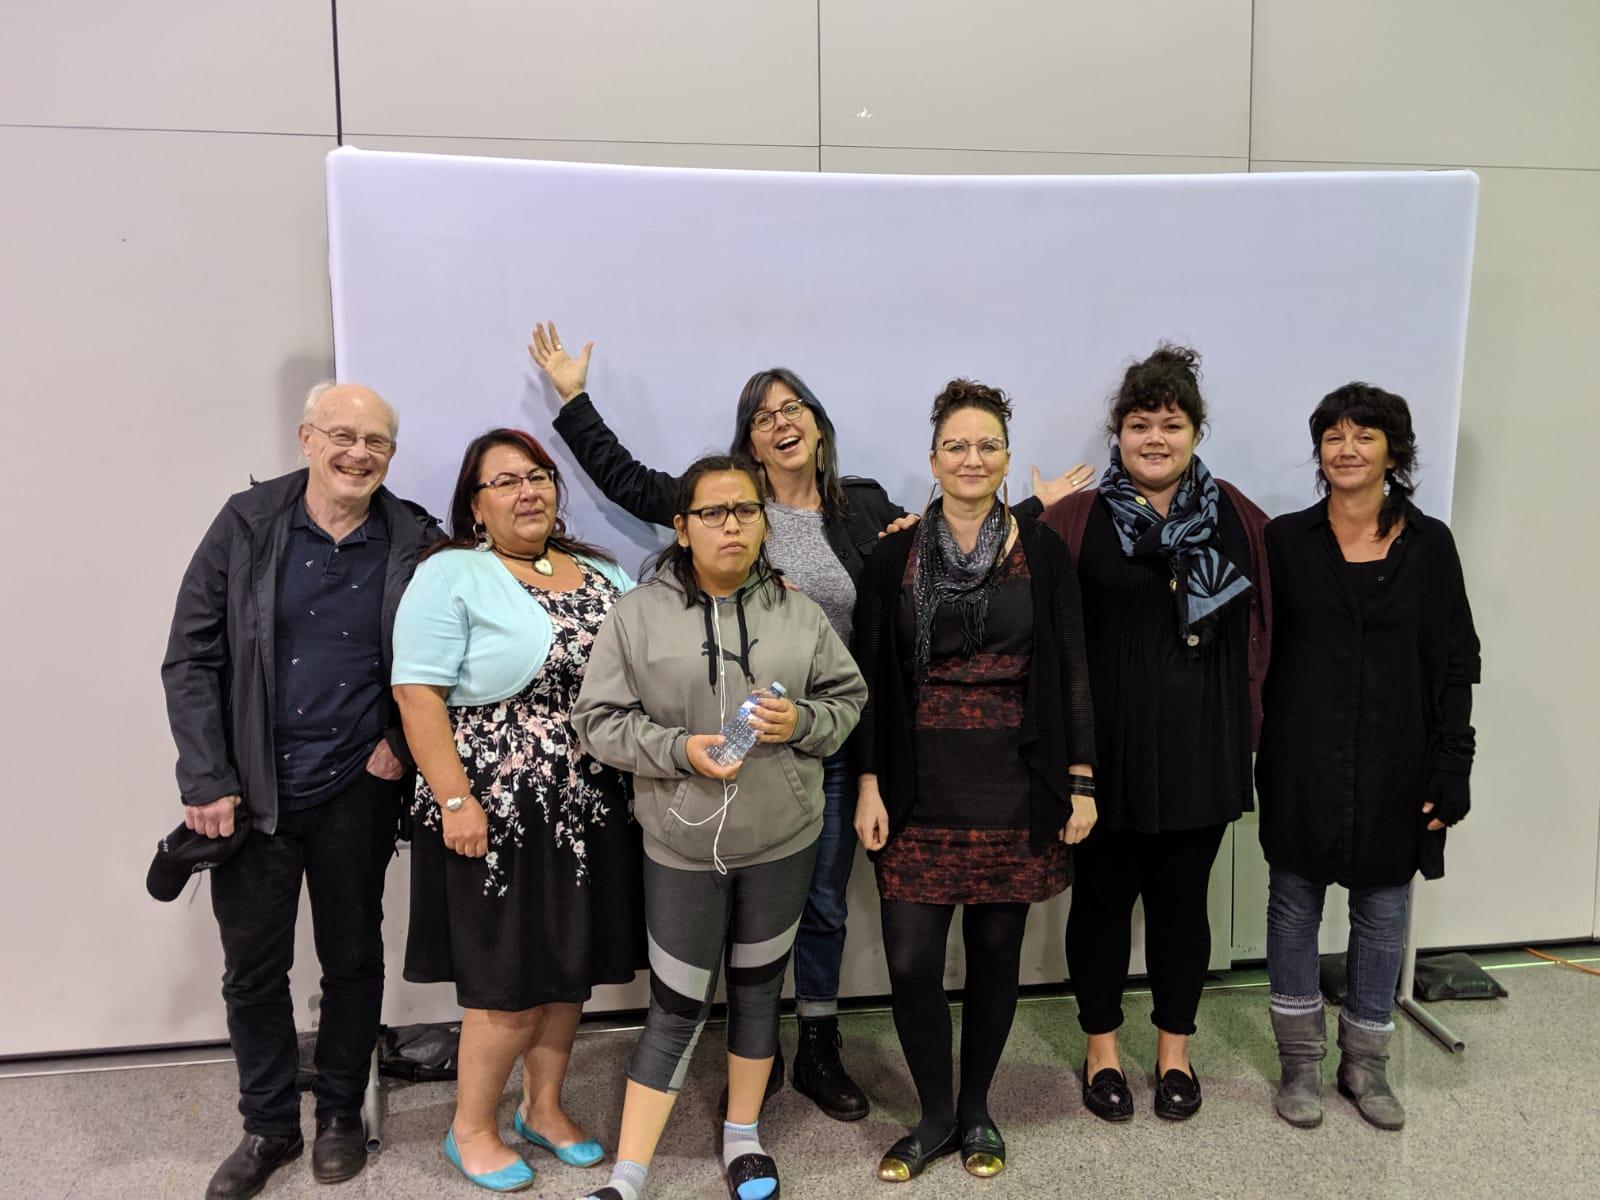 Left to right Peter, Leah, Kelly, Lisa g, Odessa, Lisa W & Sebnem